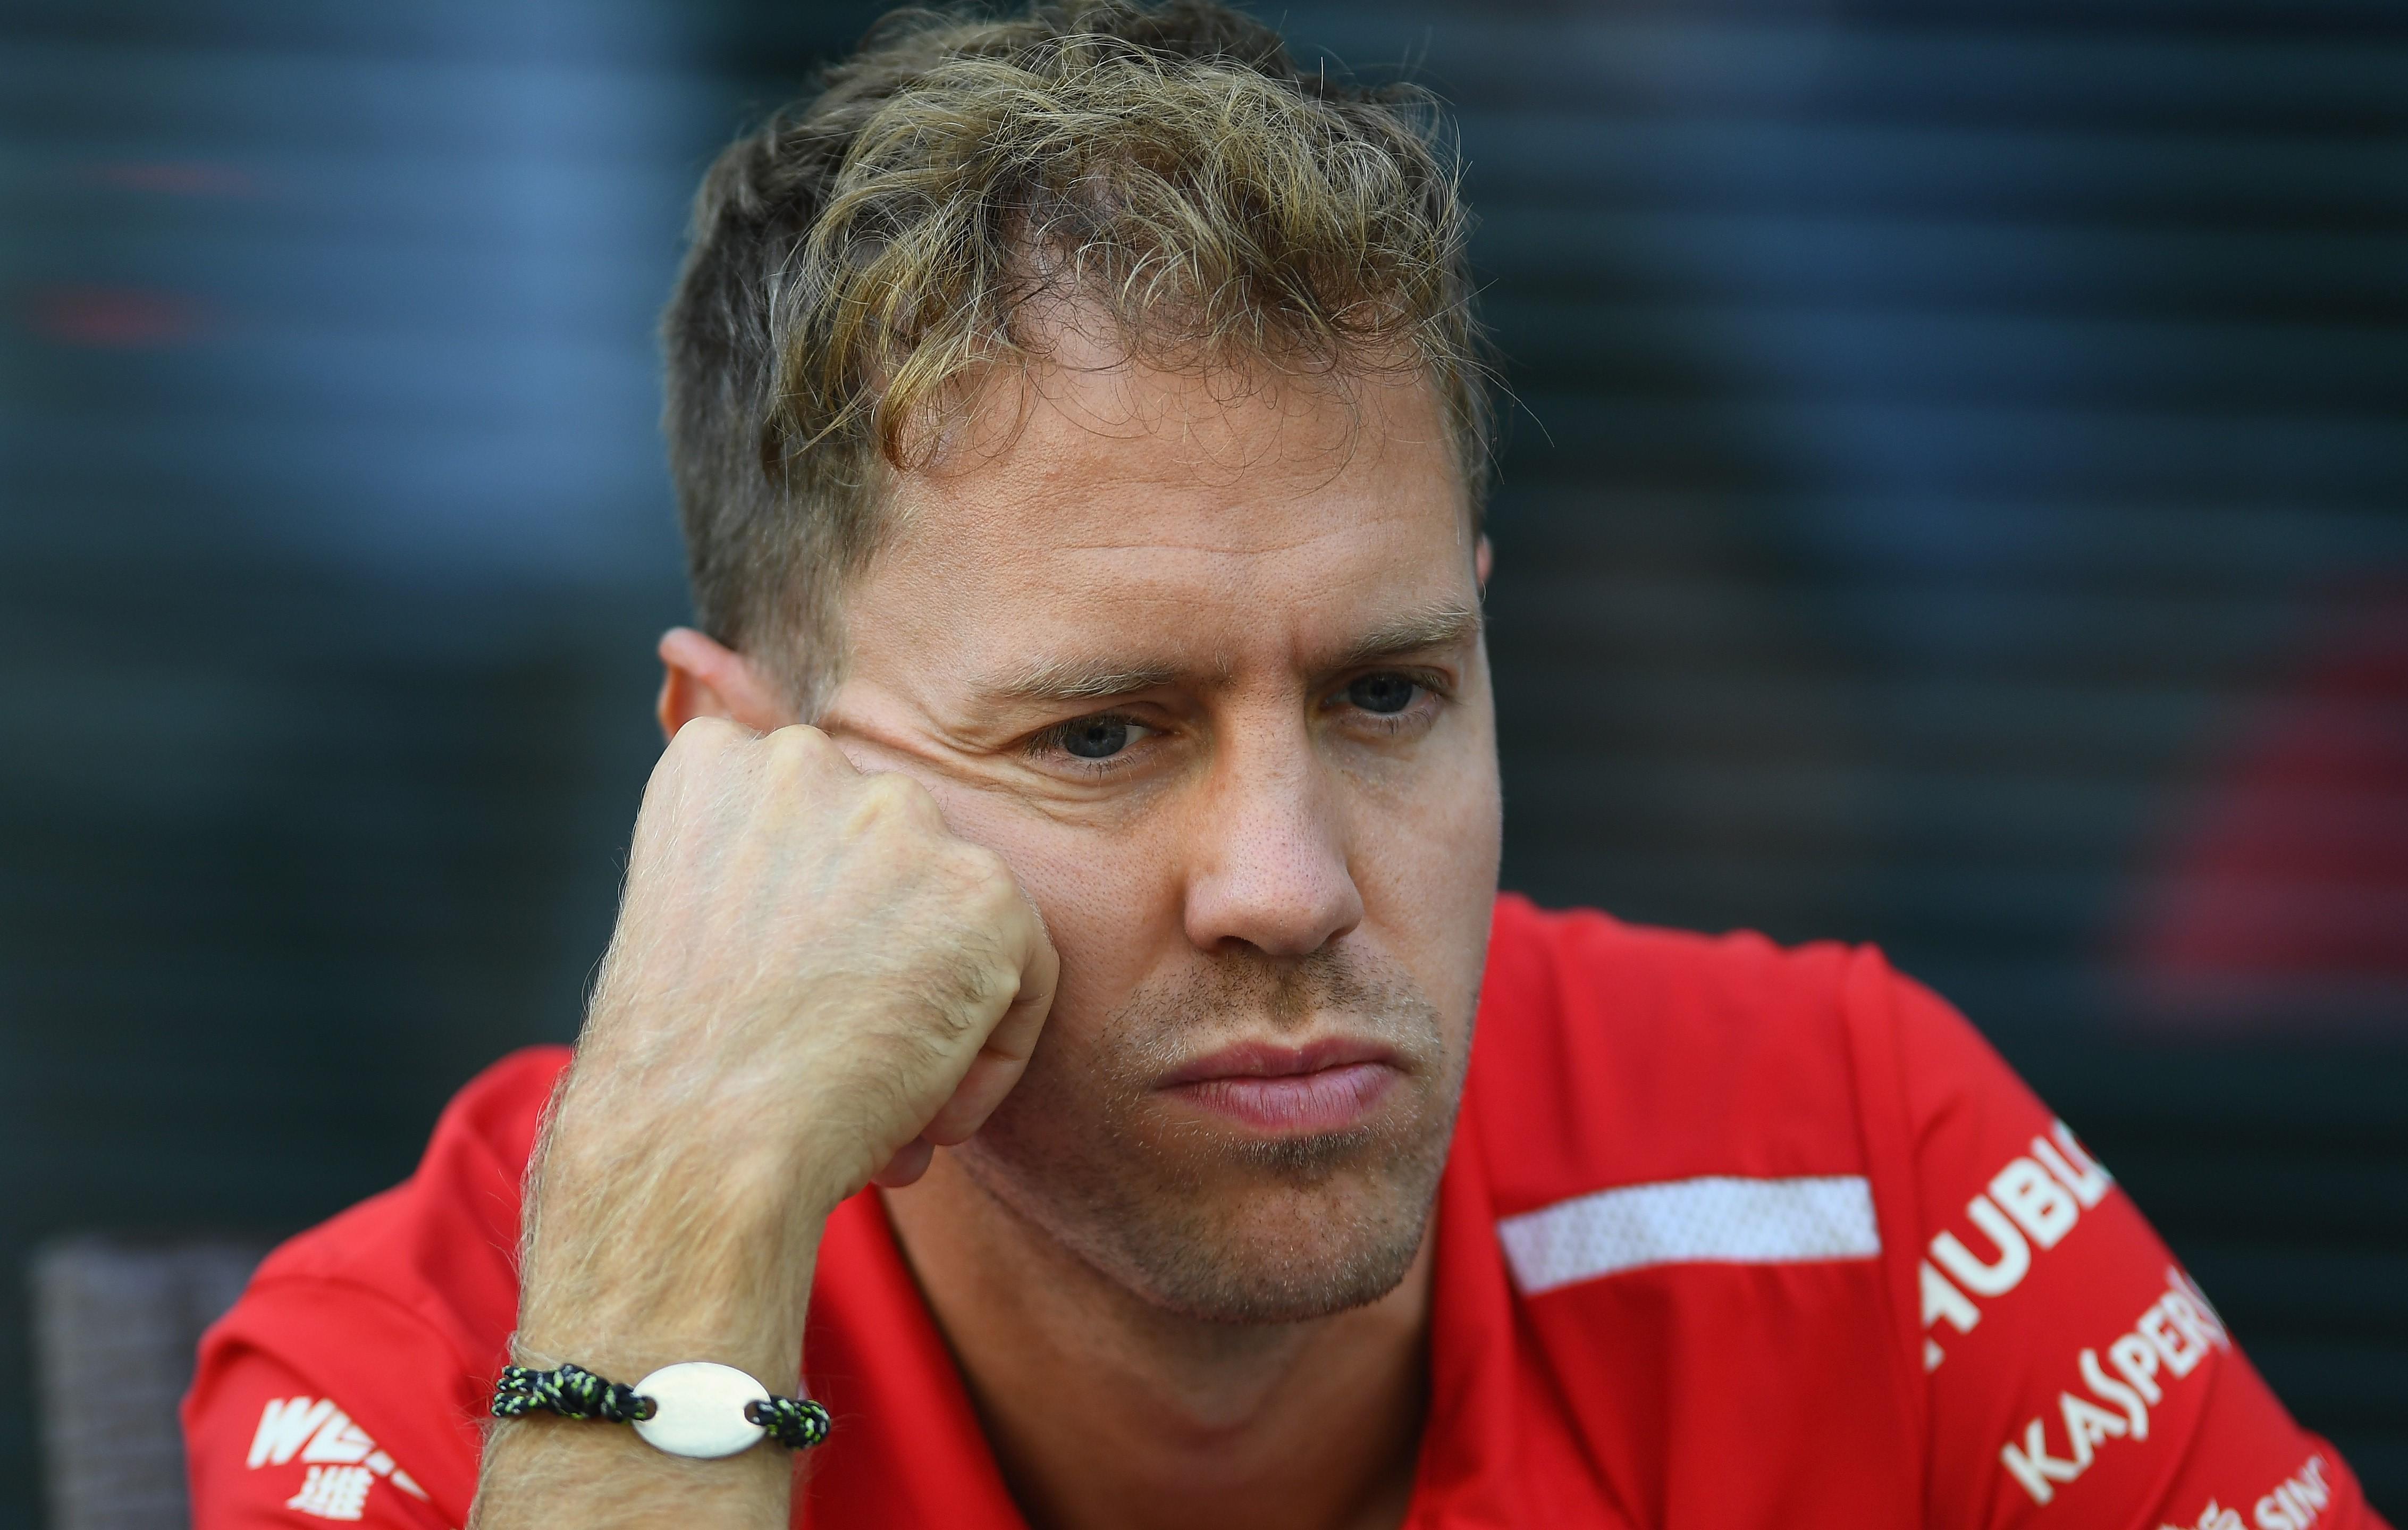 Sebastian Vettel (Ferrari) au Grand Prix de Russie 2018